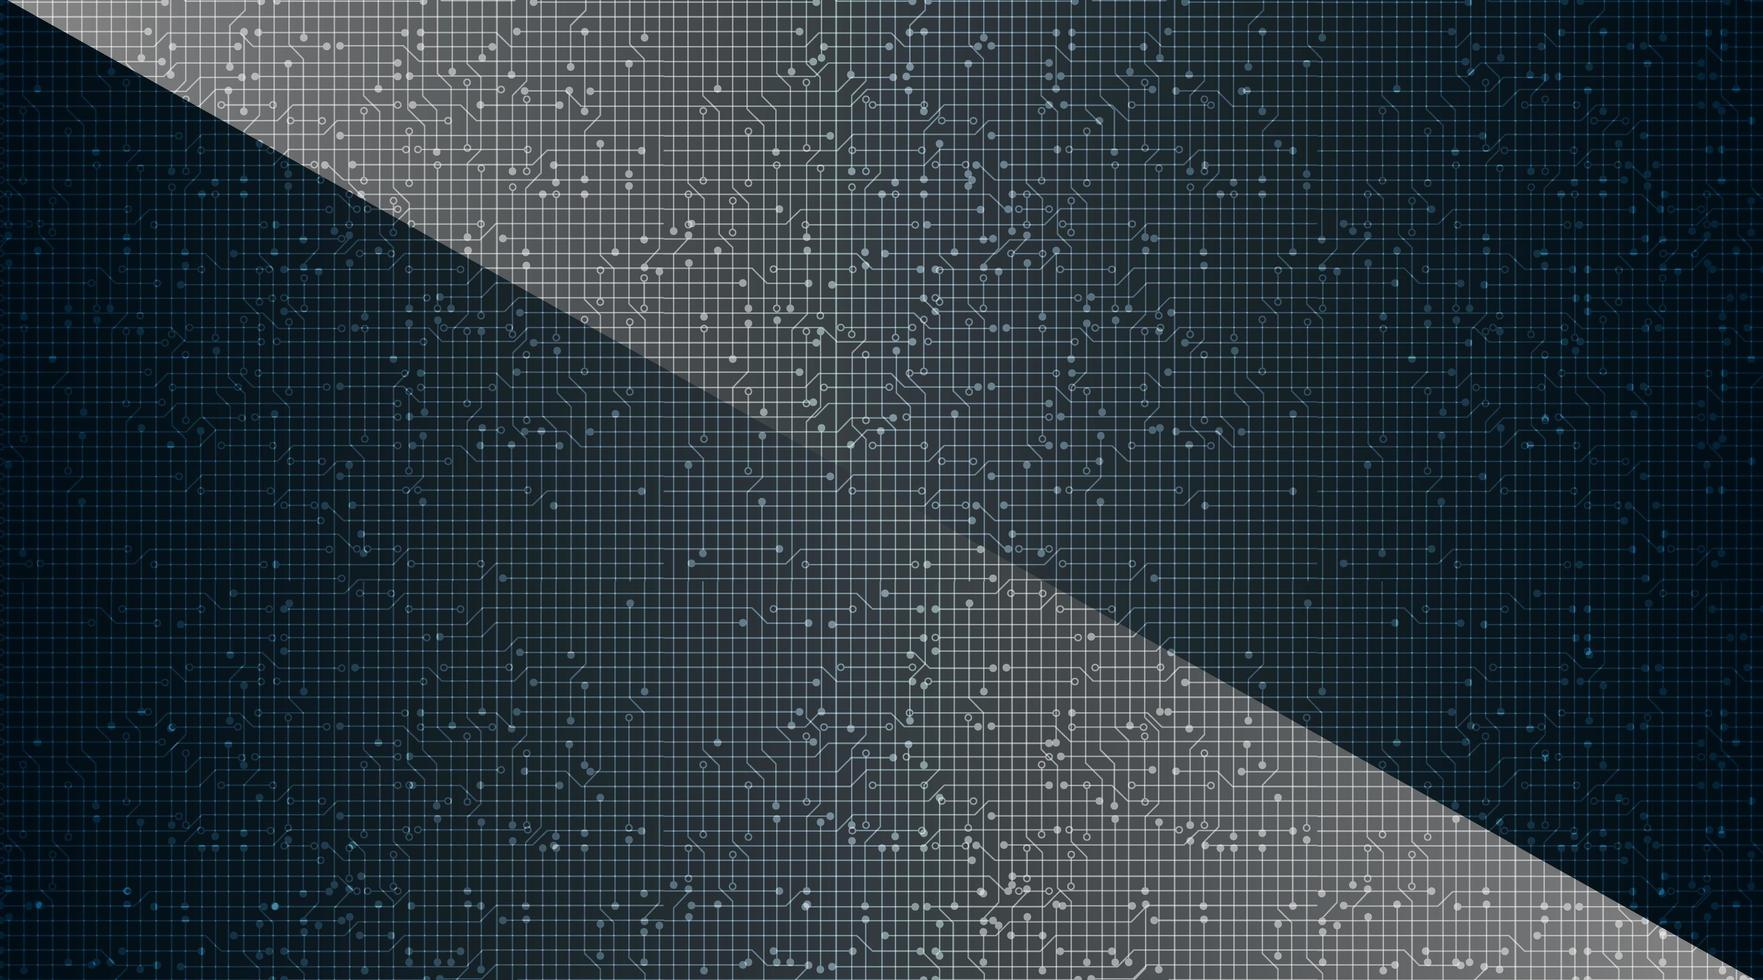 Mörk mikrochip på teknologibakgrund. vektor